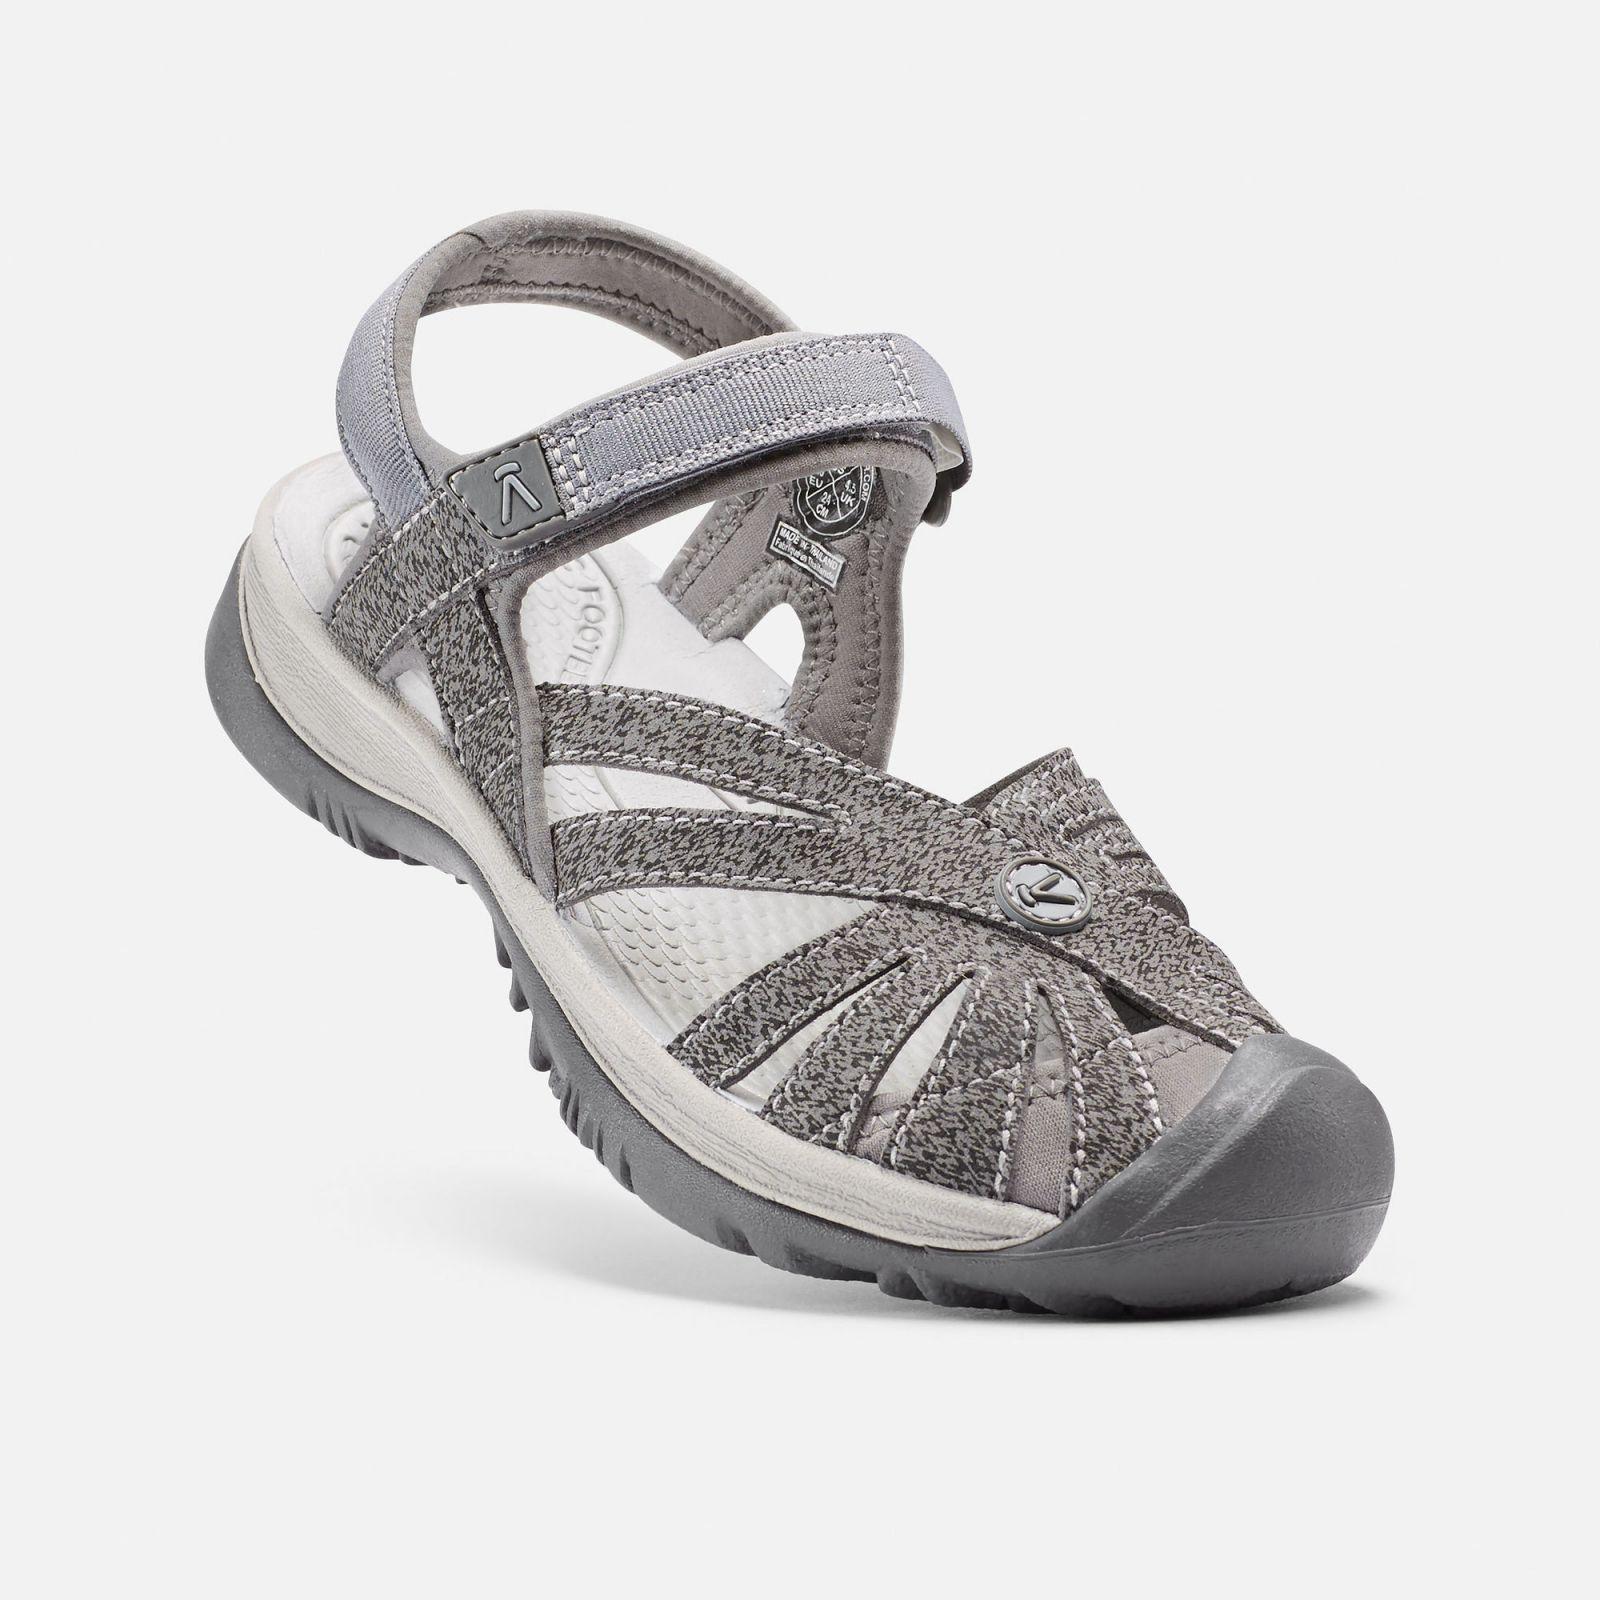 KEEN Rose Sandal W Gargoyle / Raven Dámský sandál